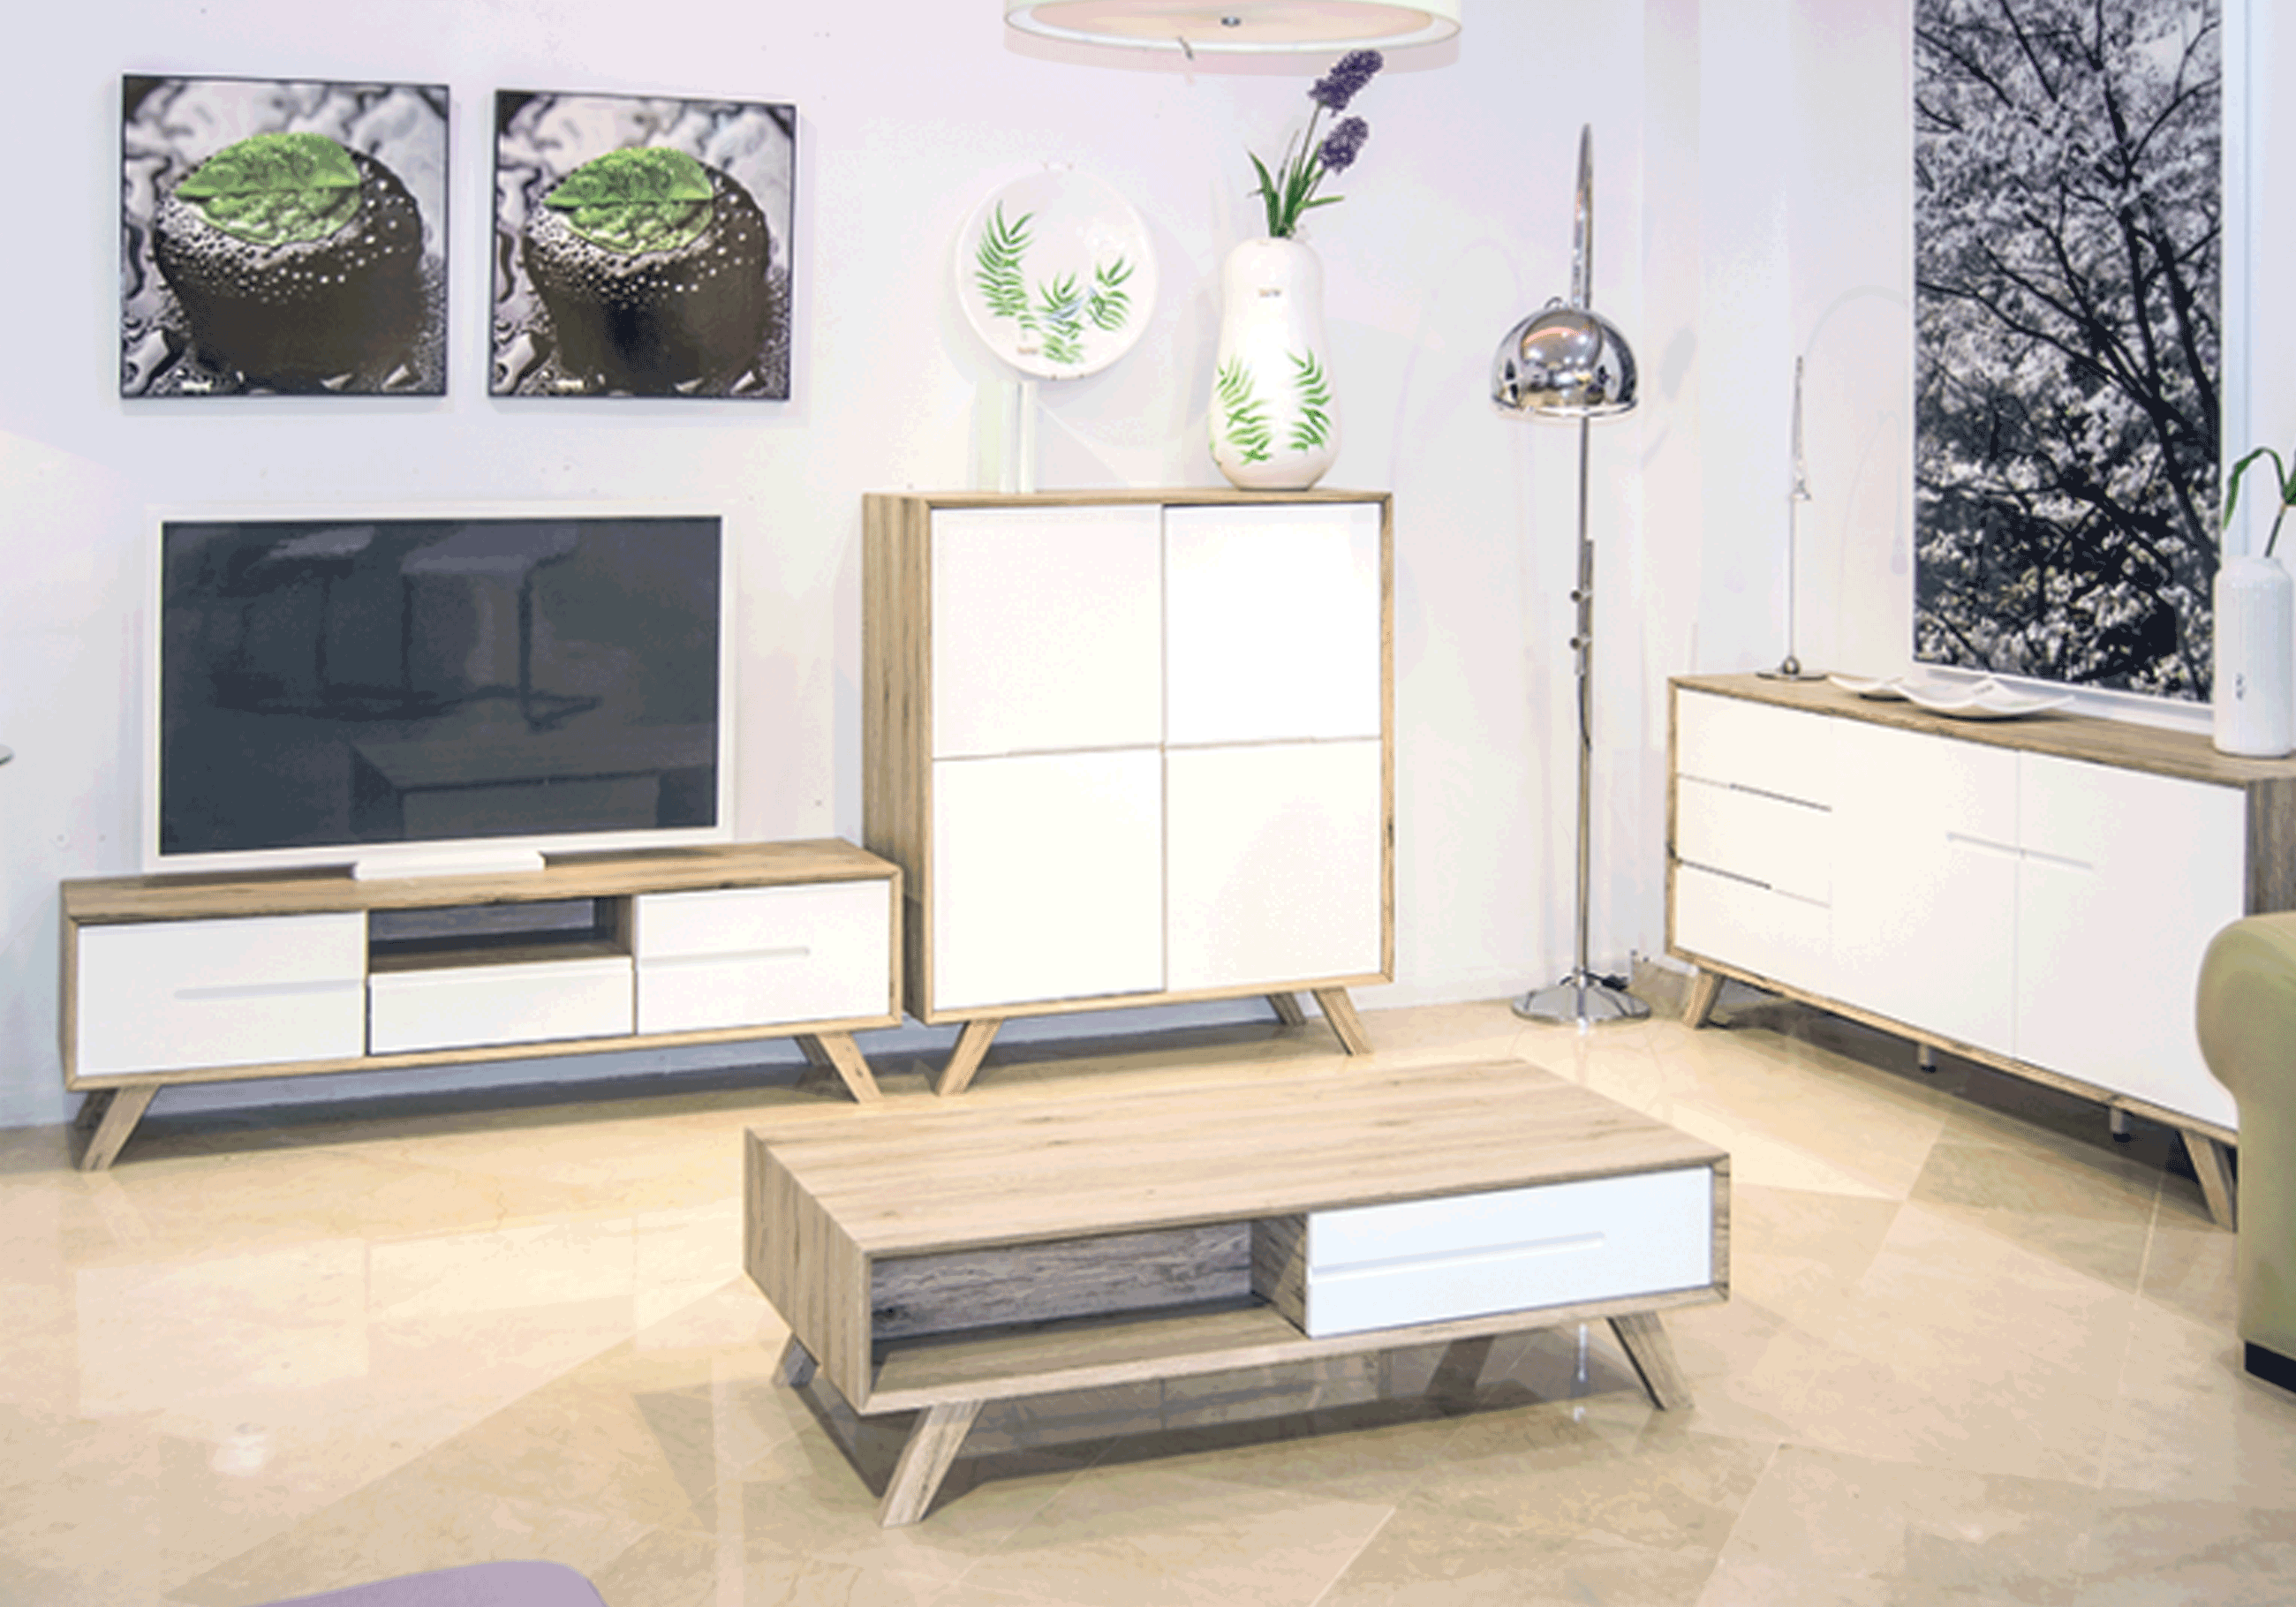 Muebles Salon Estilo nordico Mndw Prar Muebles Salà N En Sevilla Y Cà Rdoba En Muebles Sà Rria